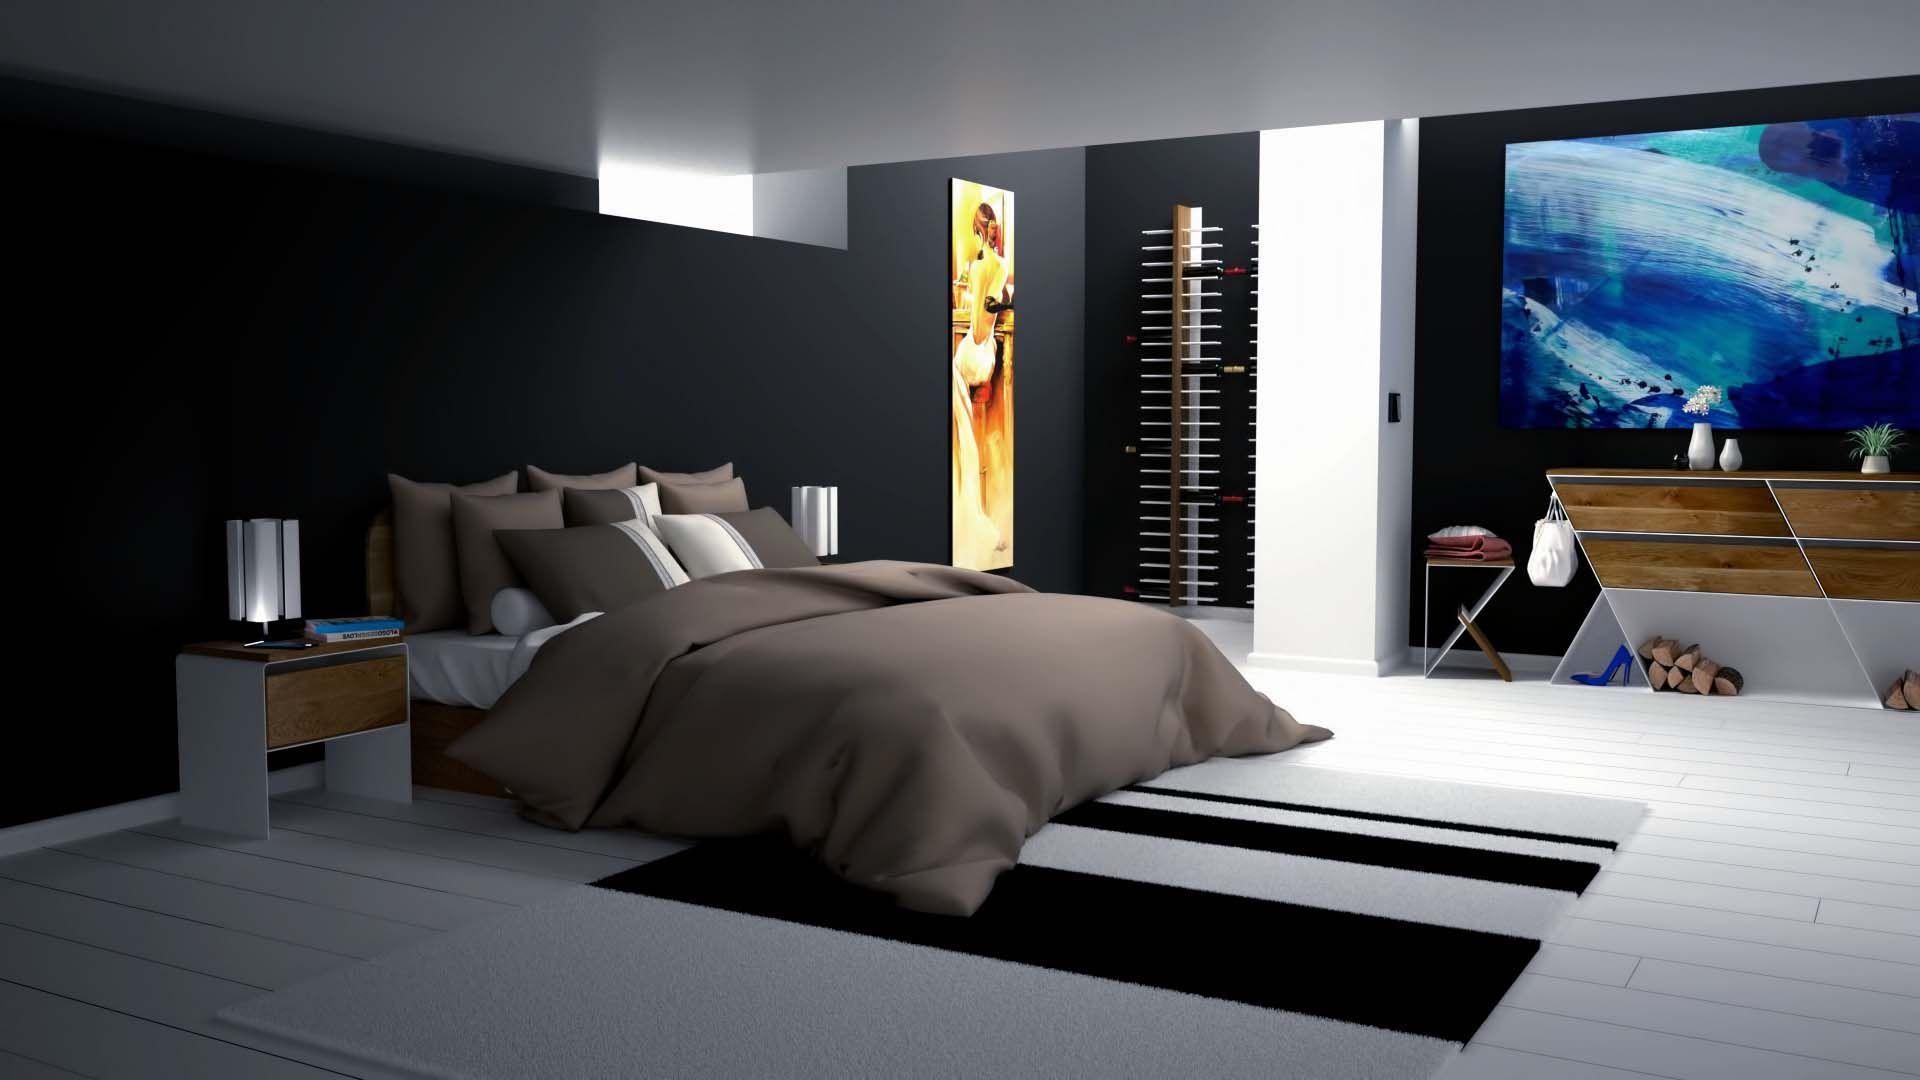 Nachttisch Weiß Metall ~ Design nachttisch modern weiss schwarz holz metall mystery manhattan